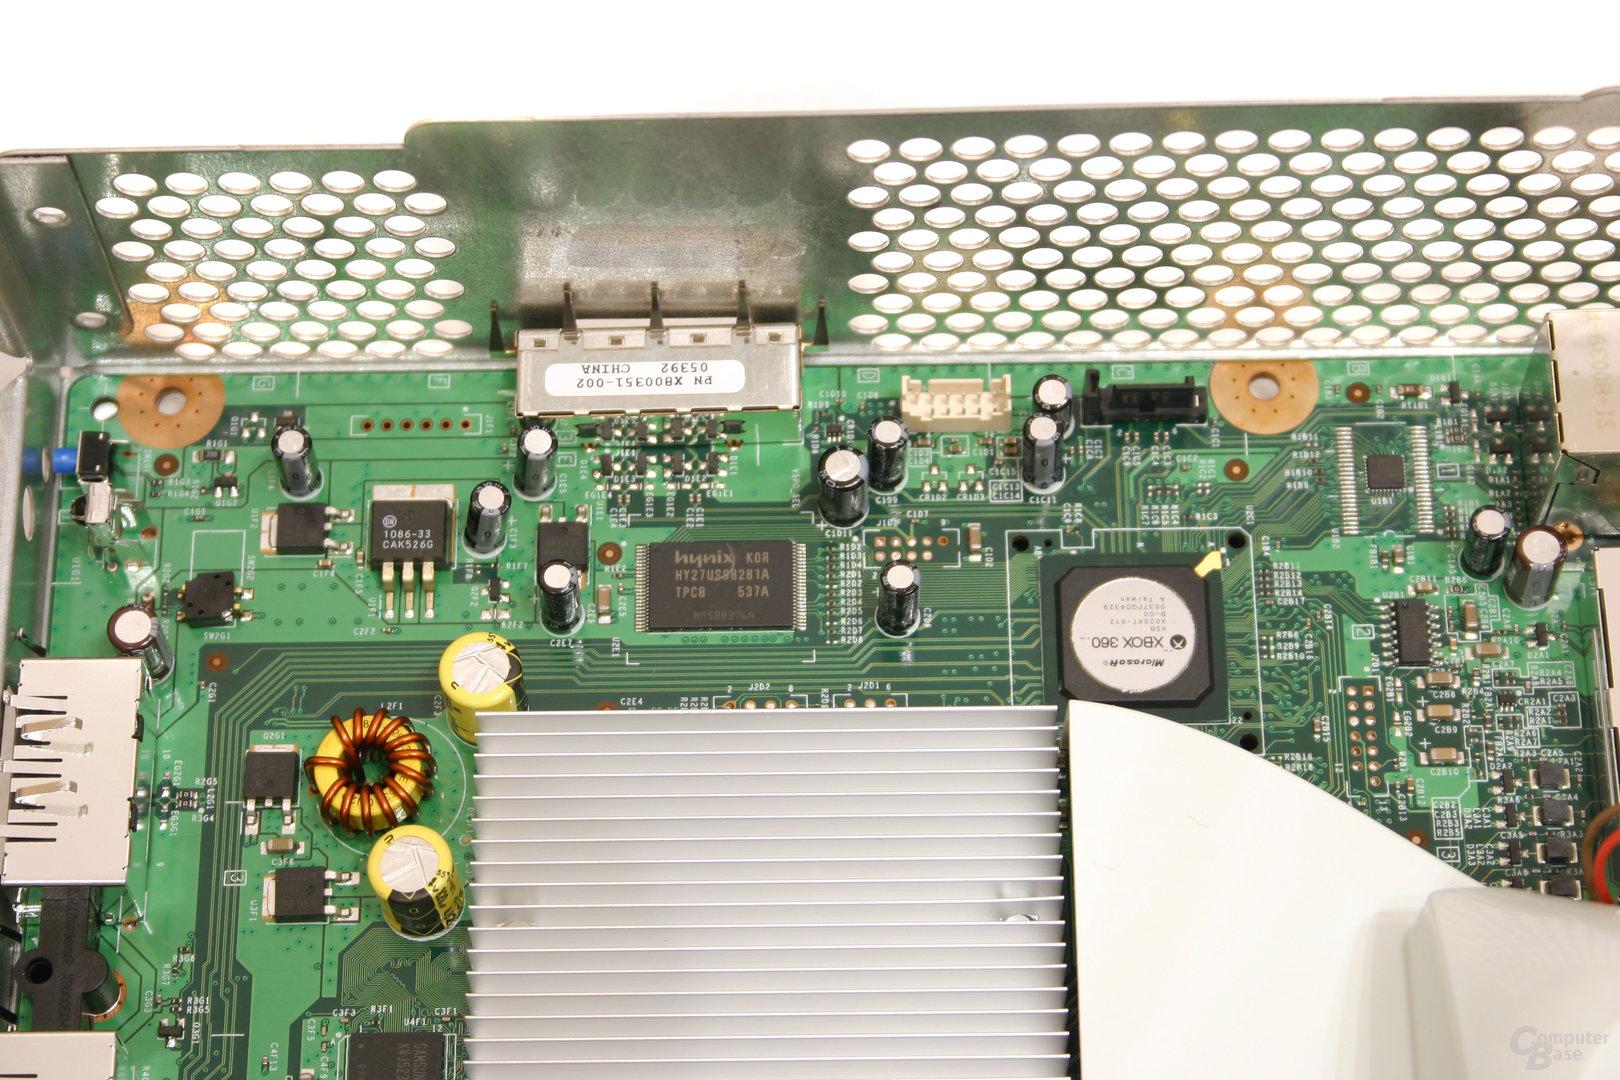 Xbox 360 - Ein Blick ins Innere - Die Festplattenschnittstelle